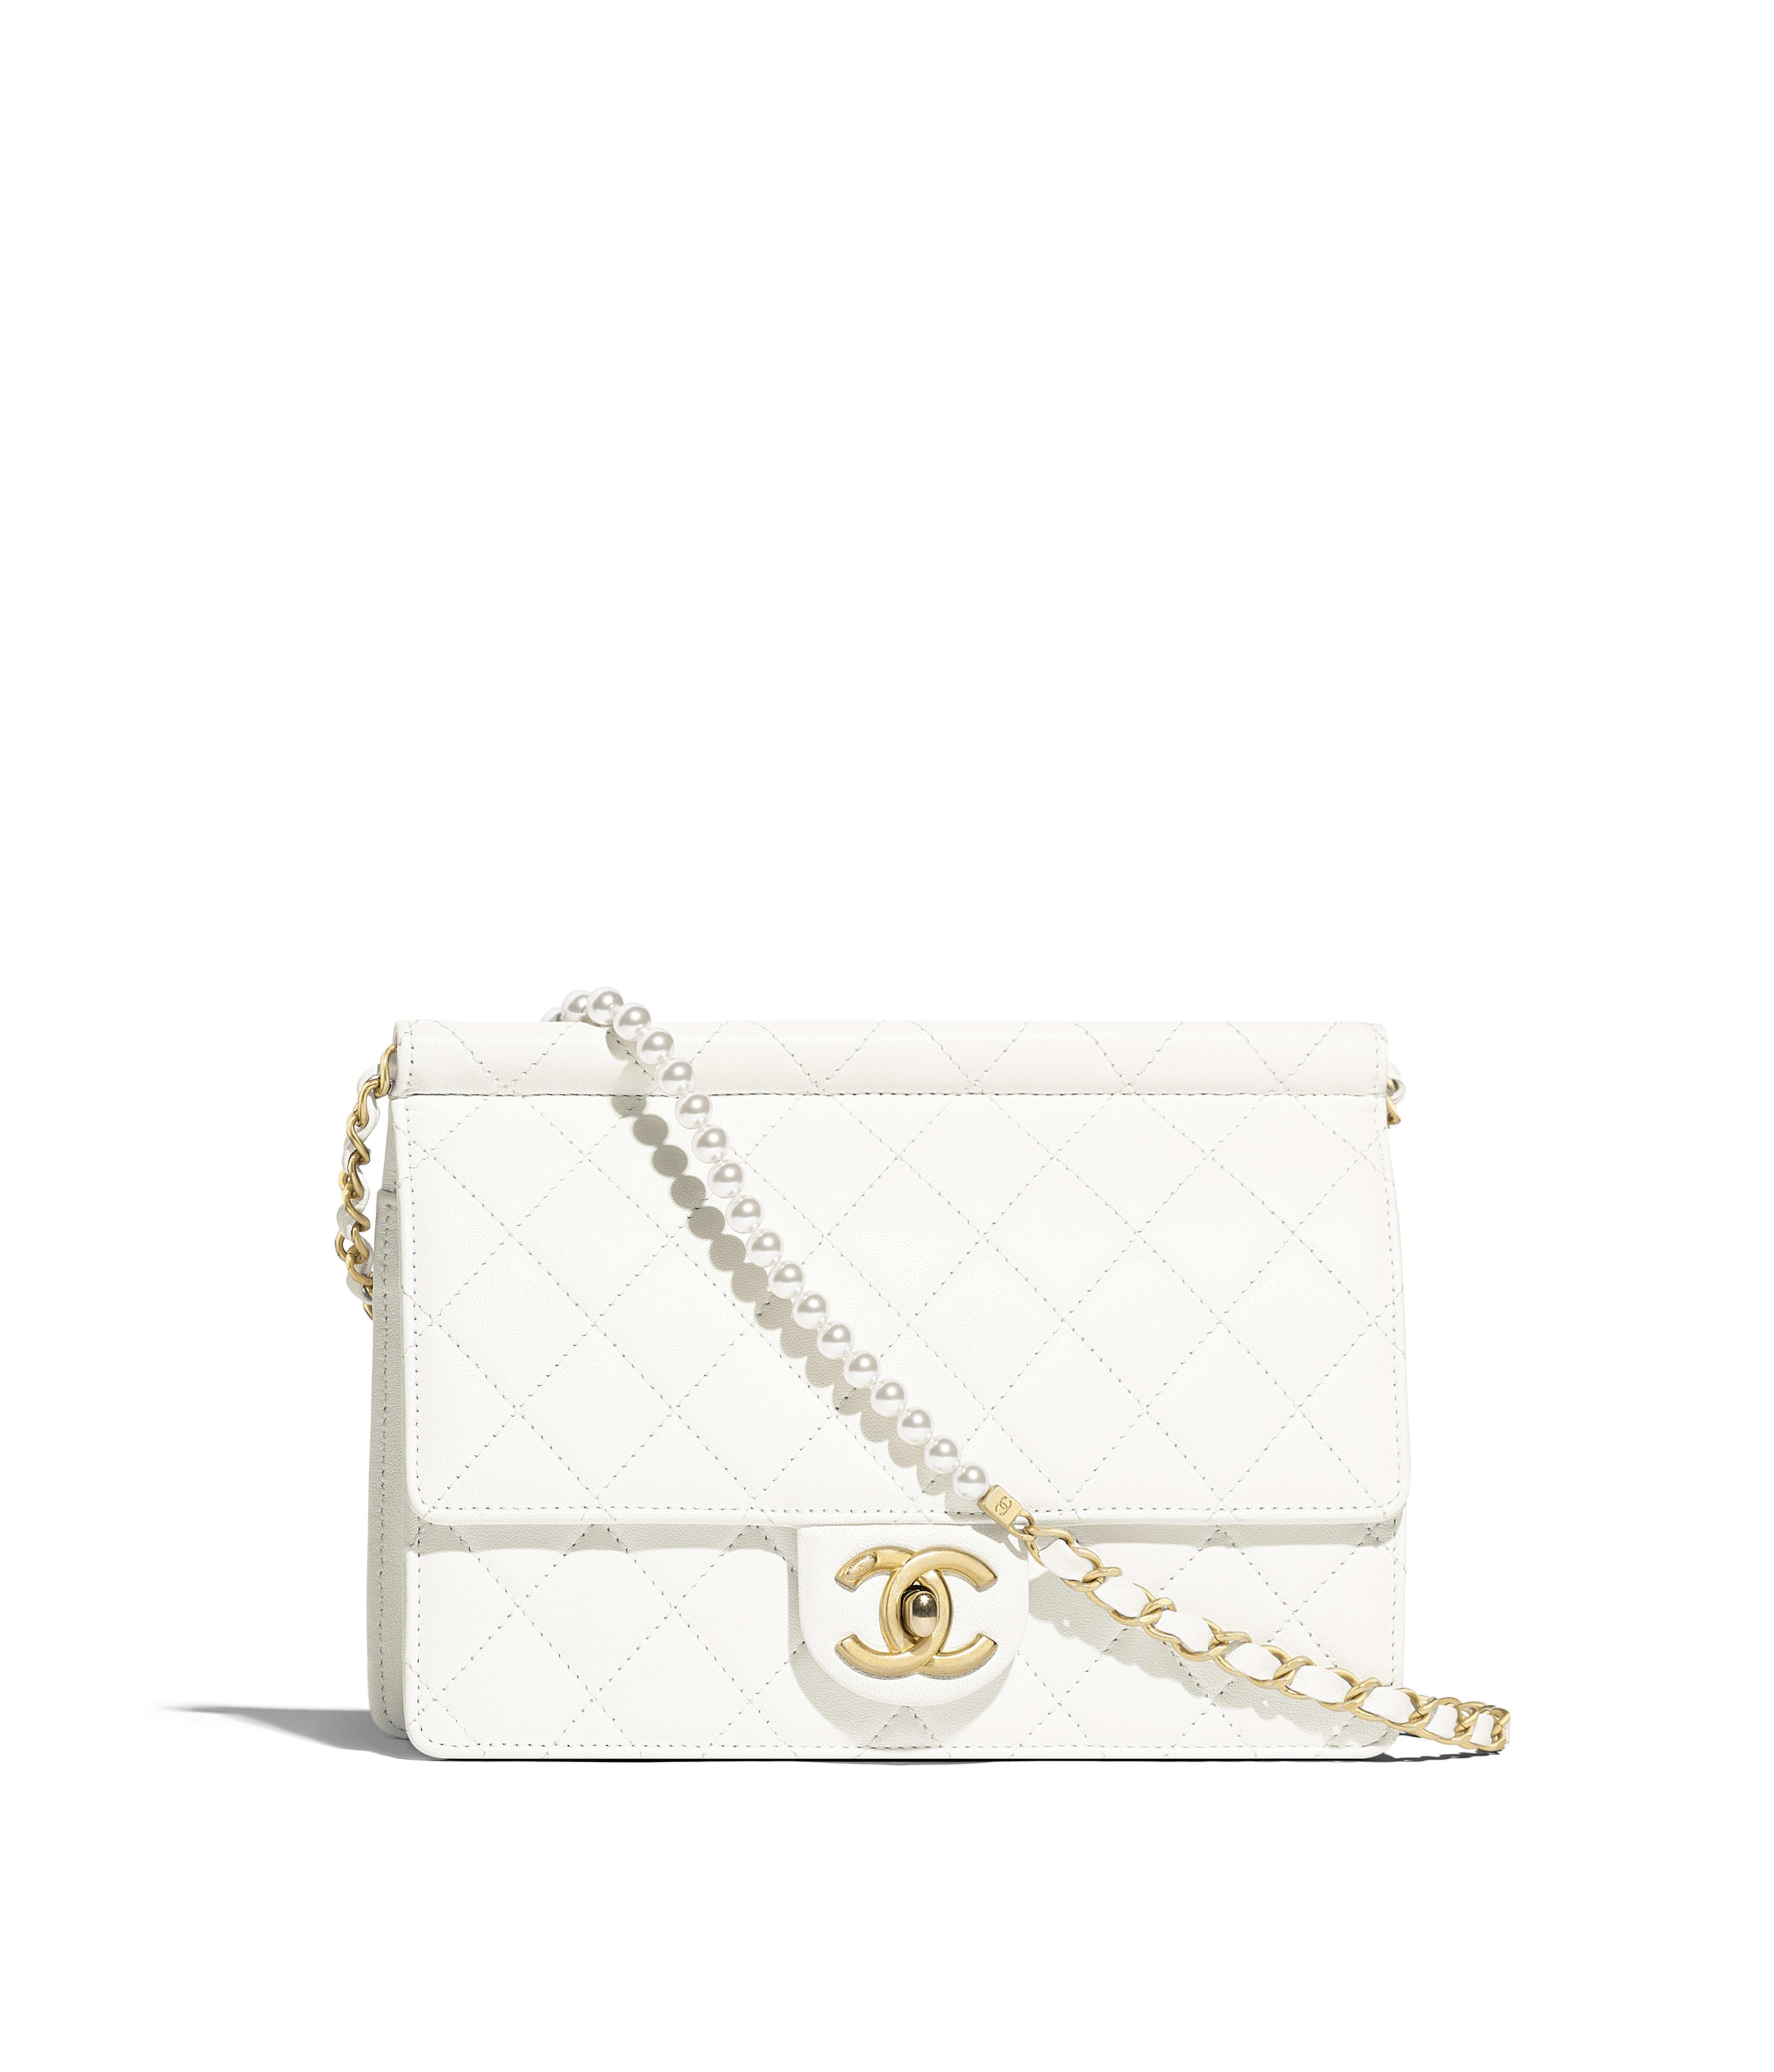 949d179619fdf0 Flap Bag Lambskin, Imitation Pearls & Gold-Tone Metal, White Ref.  AS0582B0037110601